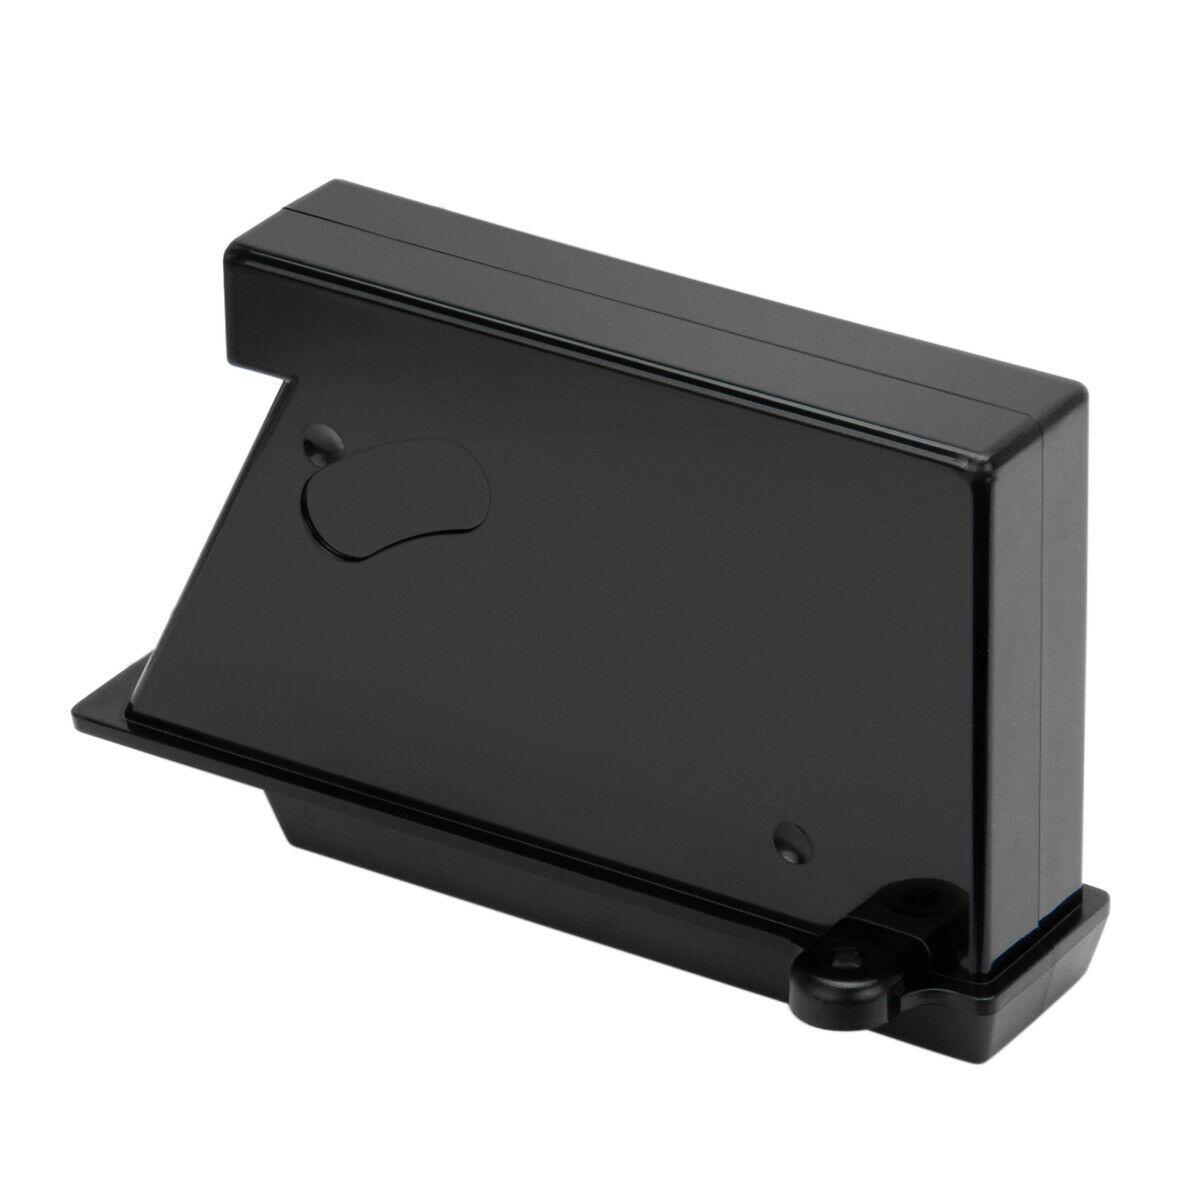 3000mAh Li-ion 14.4V LG EAC62218204 EAC60766102 VR62601LVM VR6270LVM compatible Battery